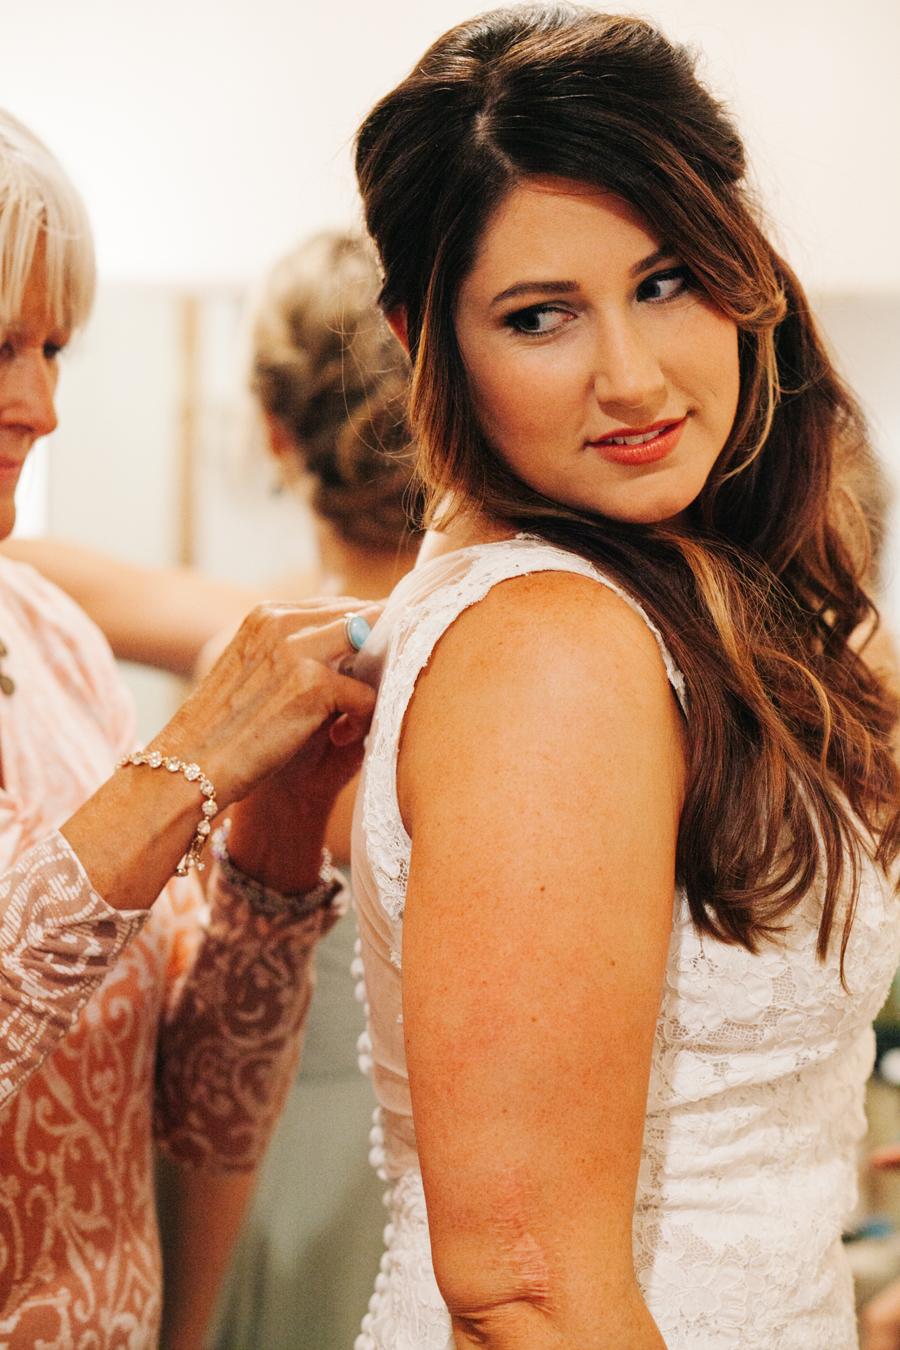 013-bellingham-wedding-photographer-katheryn-moran-photography-farm-kitchen.jpg